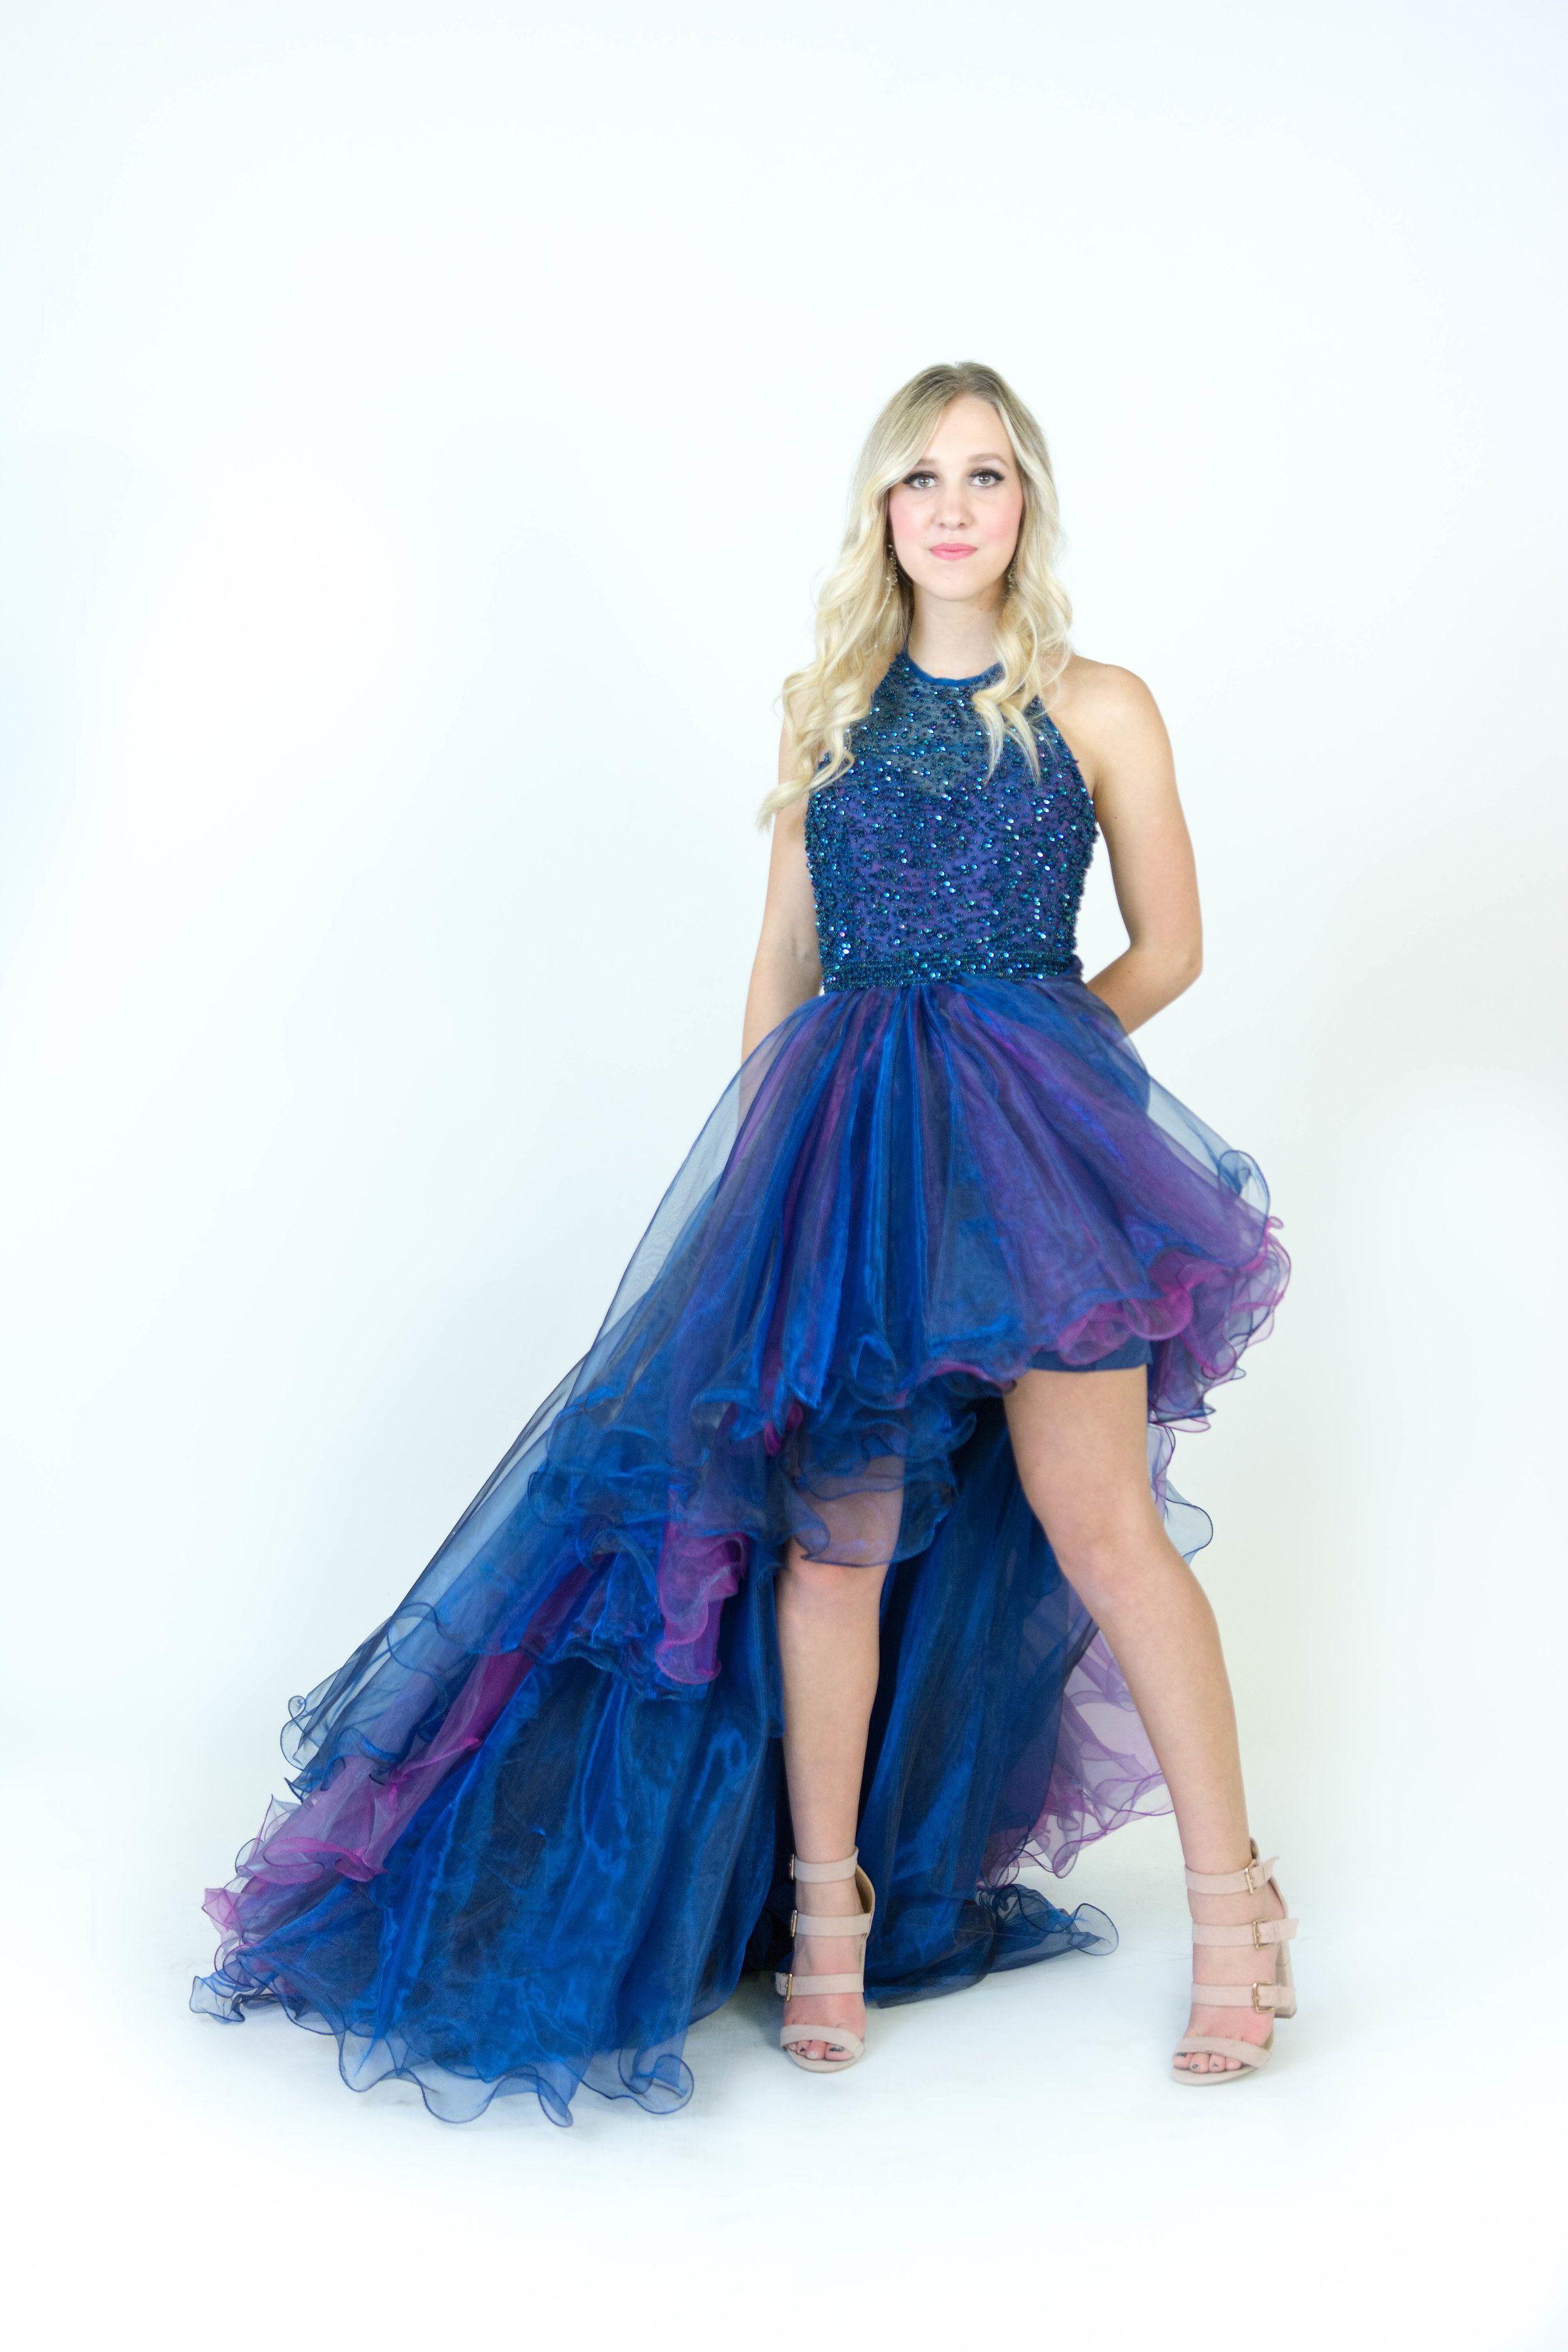 Sherri Hill High Low Royal Blue And Iridescent Purple Skirt Ypsilon Dresses Prom Pageant Evening W Prom Dresses Long Blue Purple Prom Dress Red Prom Dress Long [ 3600 x 2400 Pixel ]